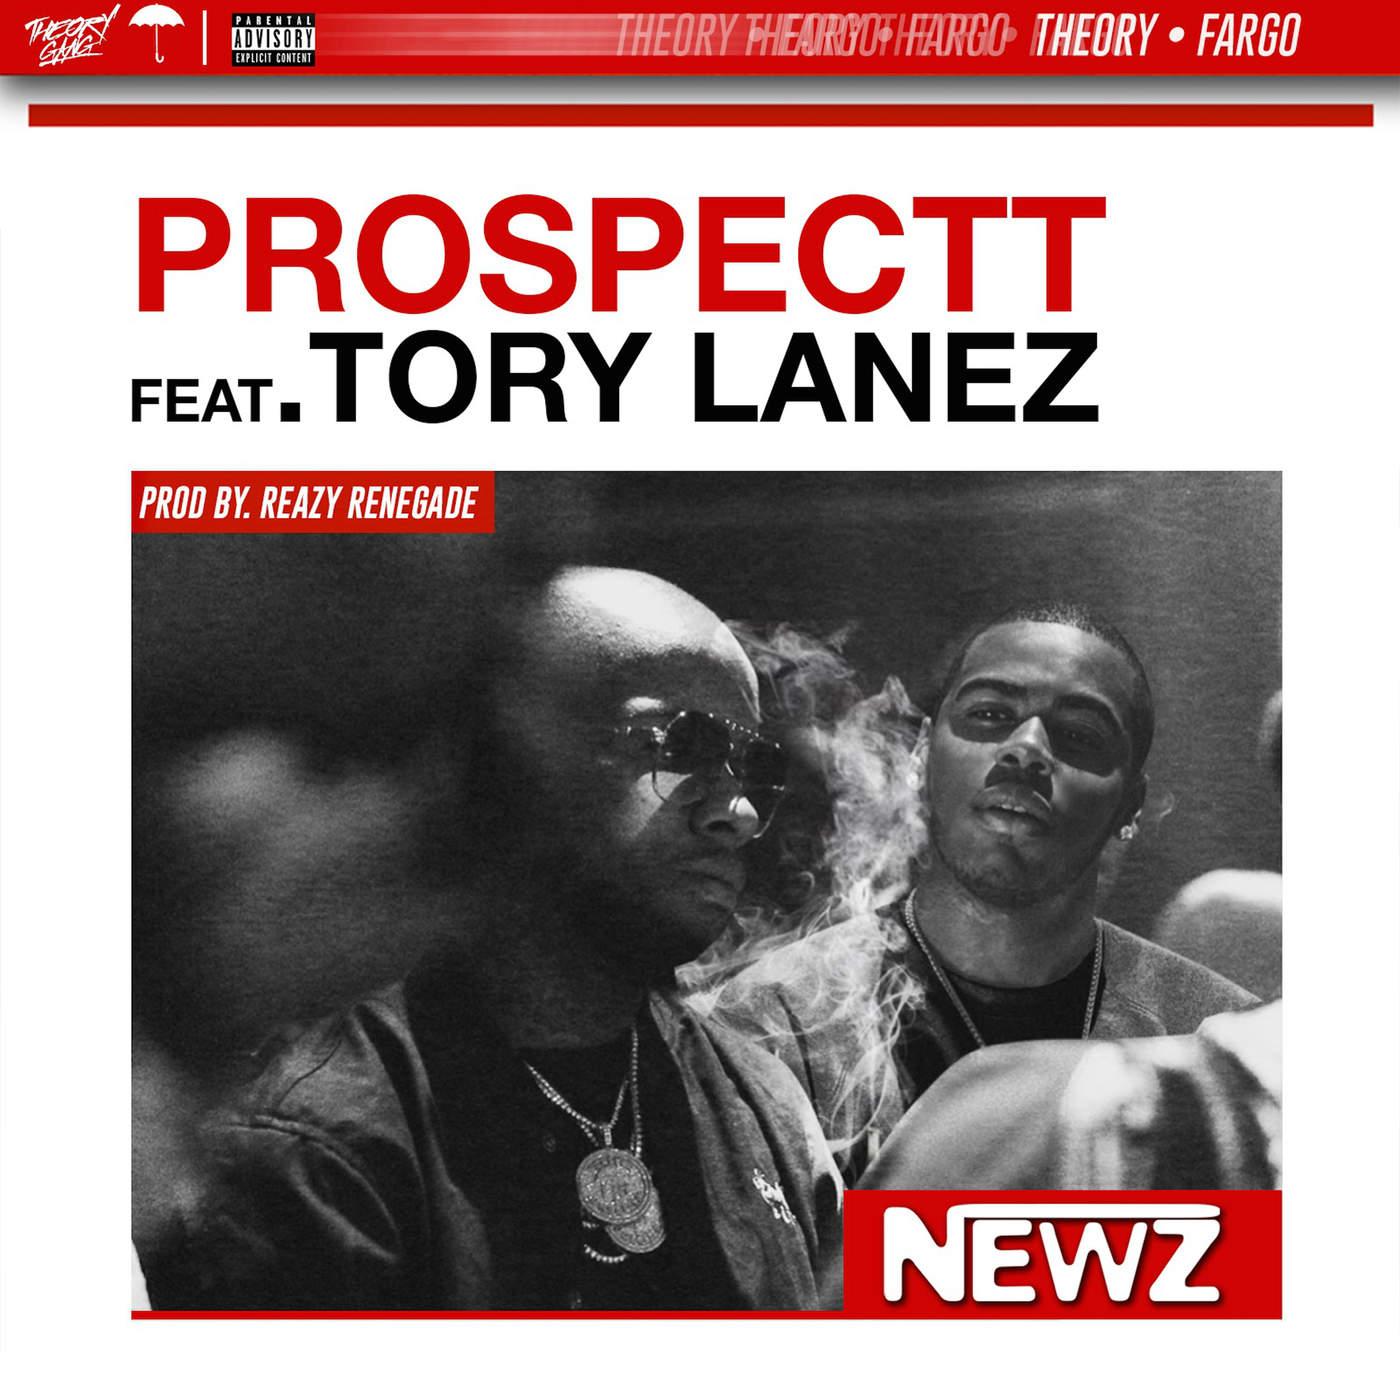 Prospectt - Newz (feat. Tory Lanez) - Single Cover